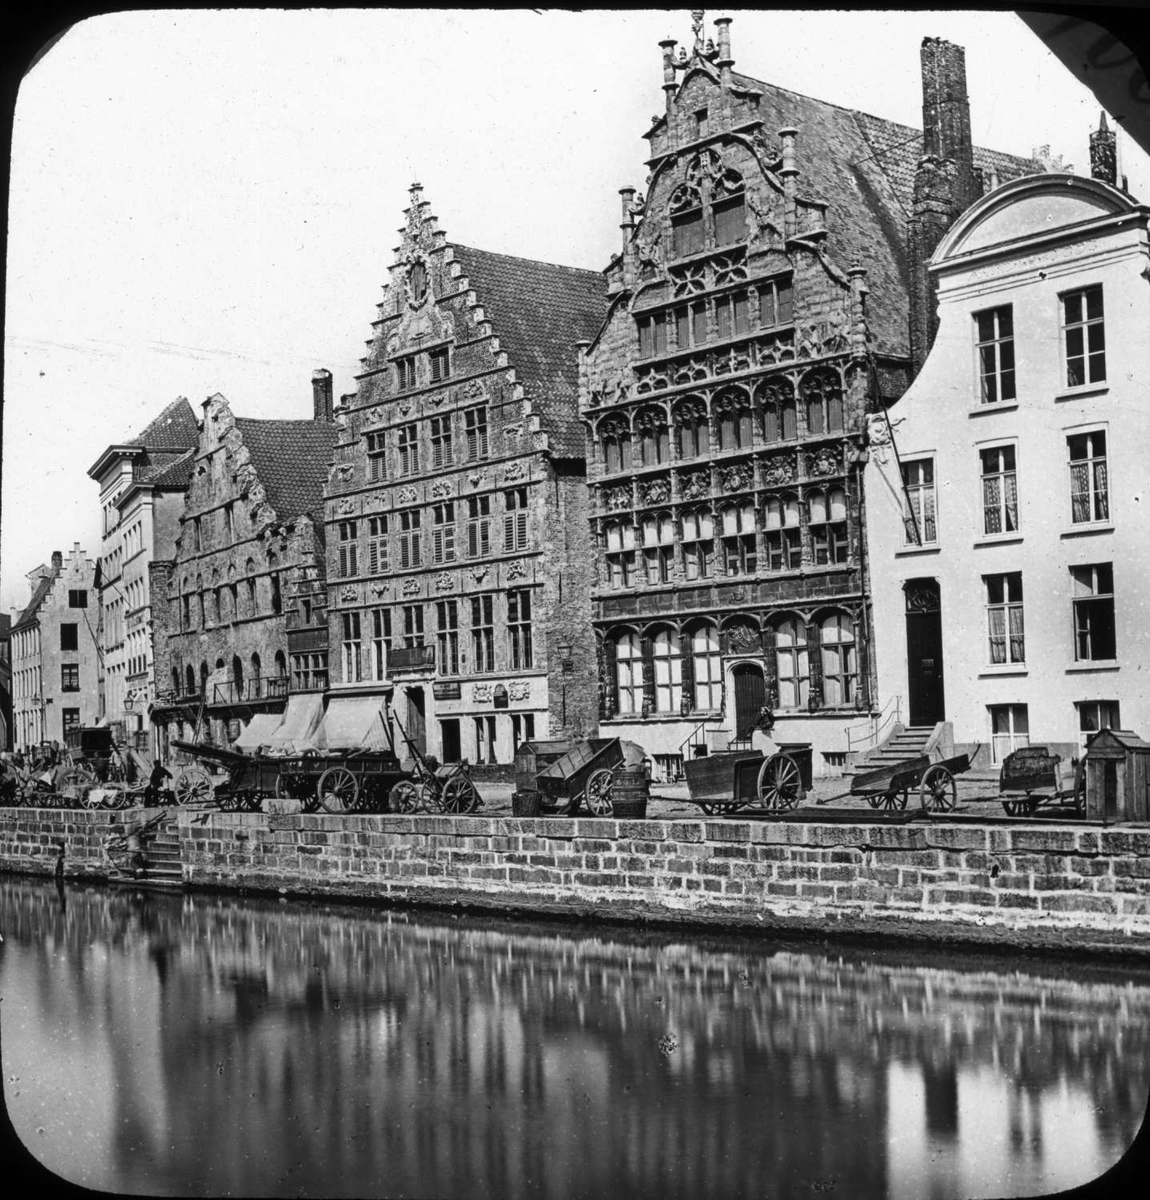 Gent i Belgia